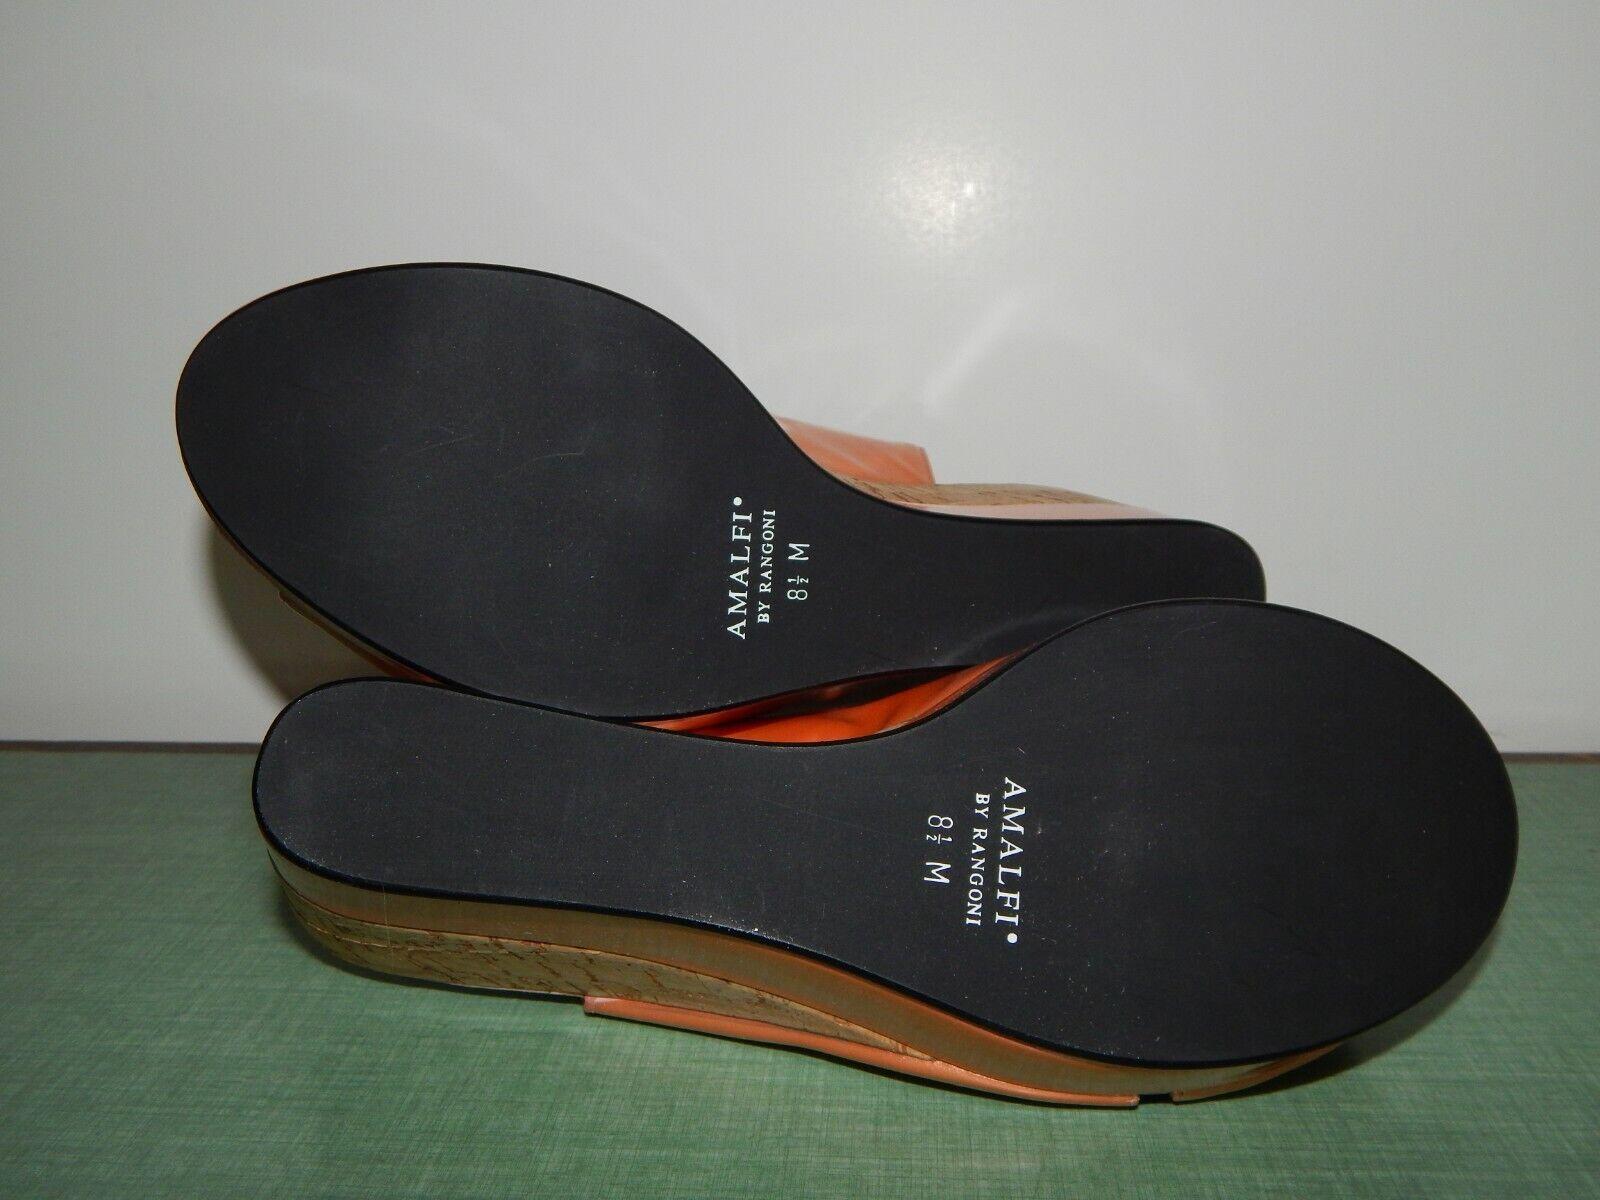 NEW Amalfi Cork Wedge Sling Sandals Apricot Peach Pink 8.5 M